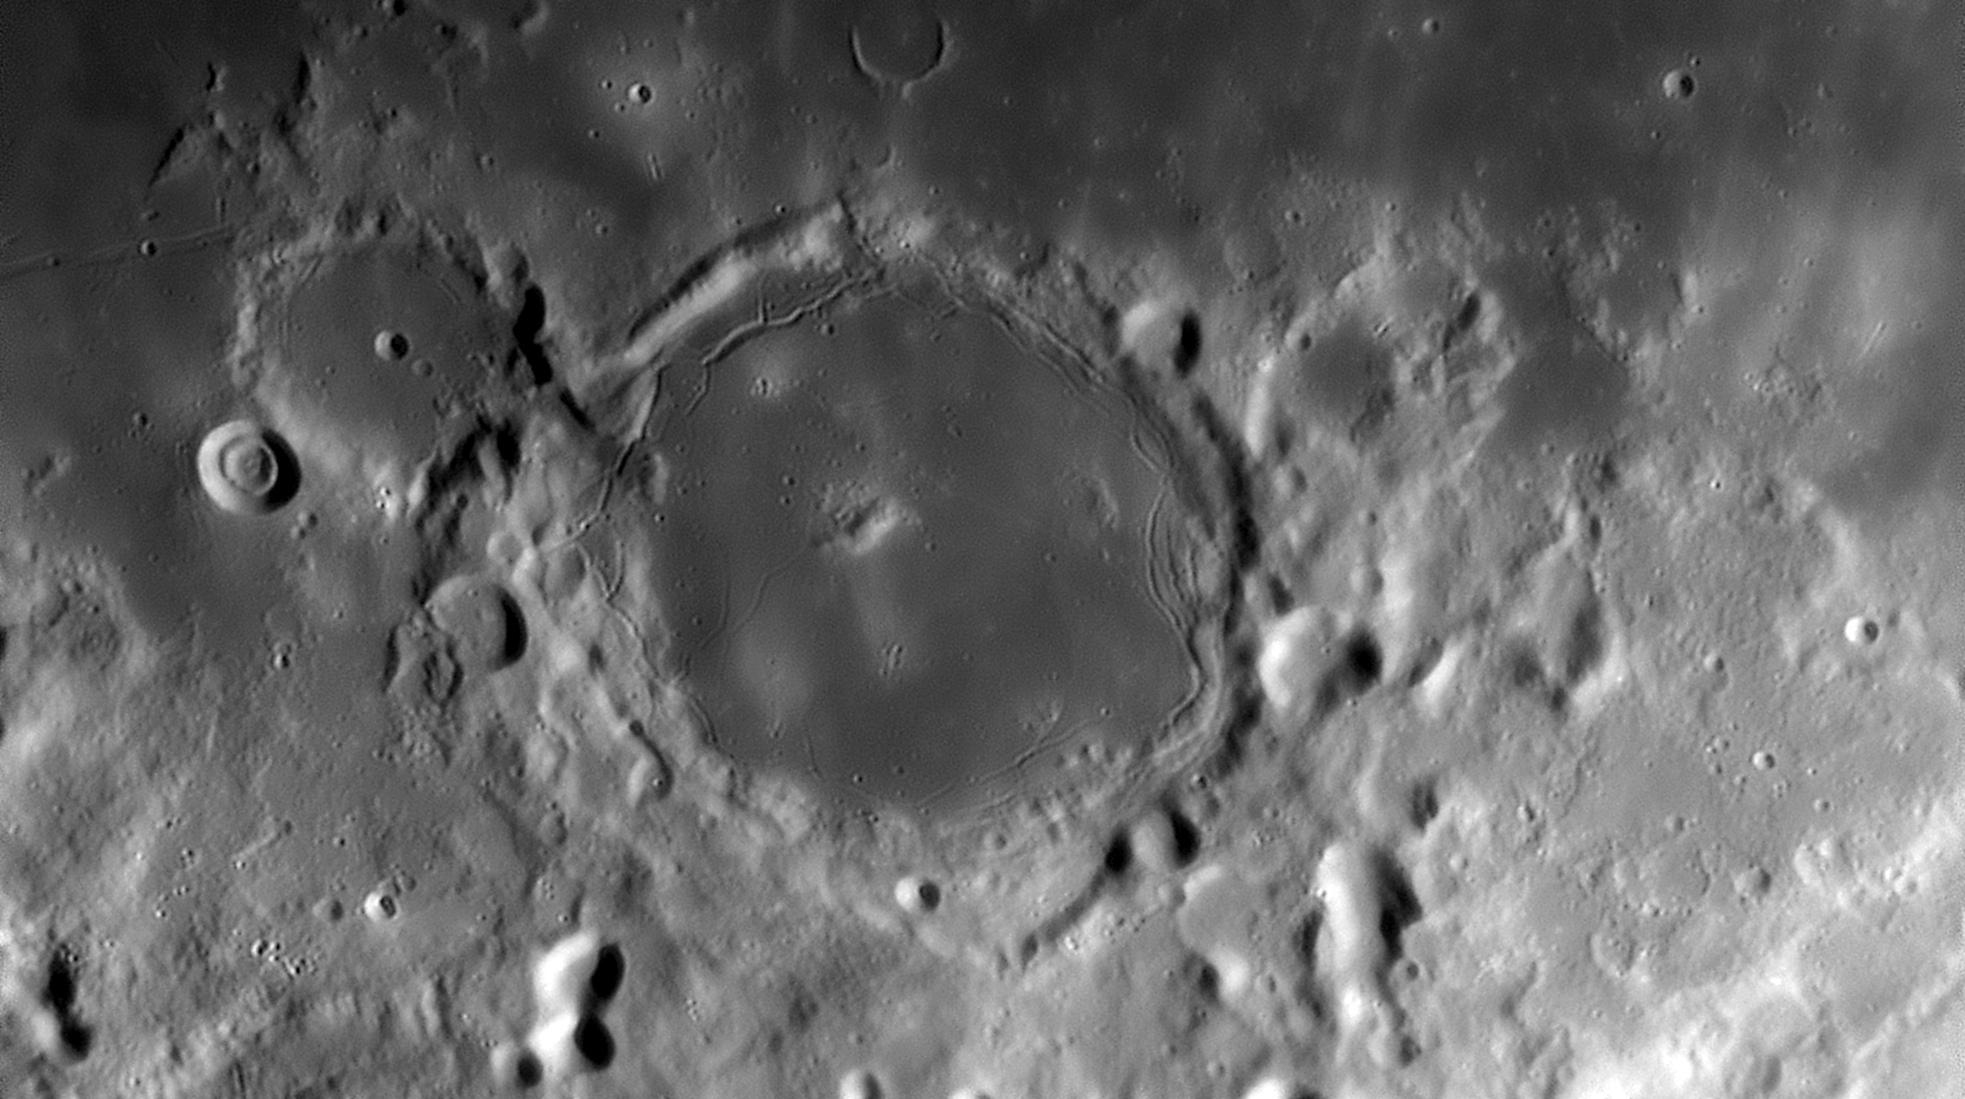 large.moon_CAS-03_04_2020_PITATUS.jpg.ce515d7814240b1ca5ec06bc3dd7e808.jpg